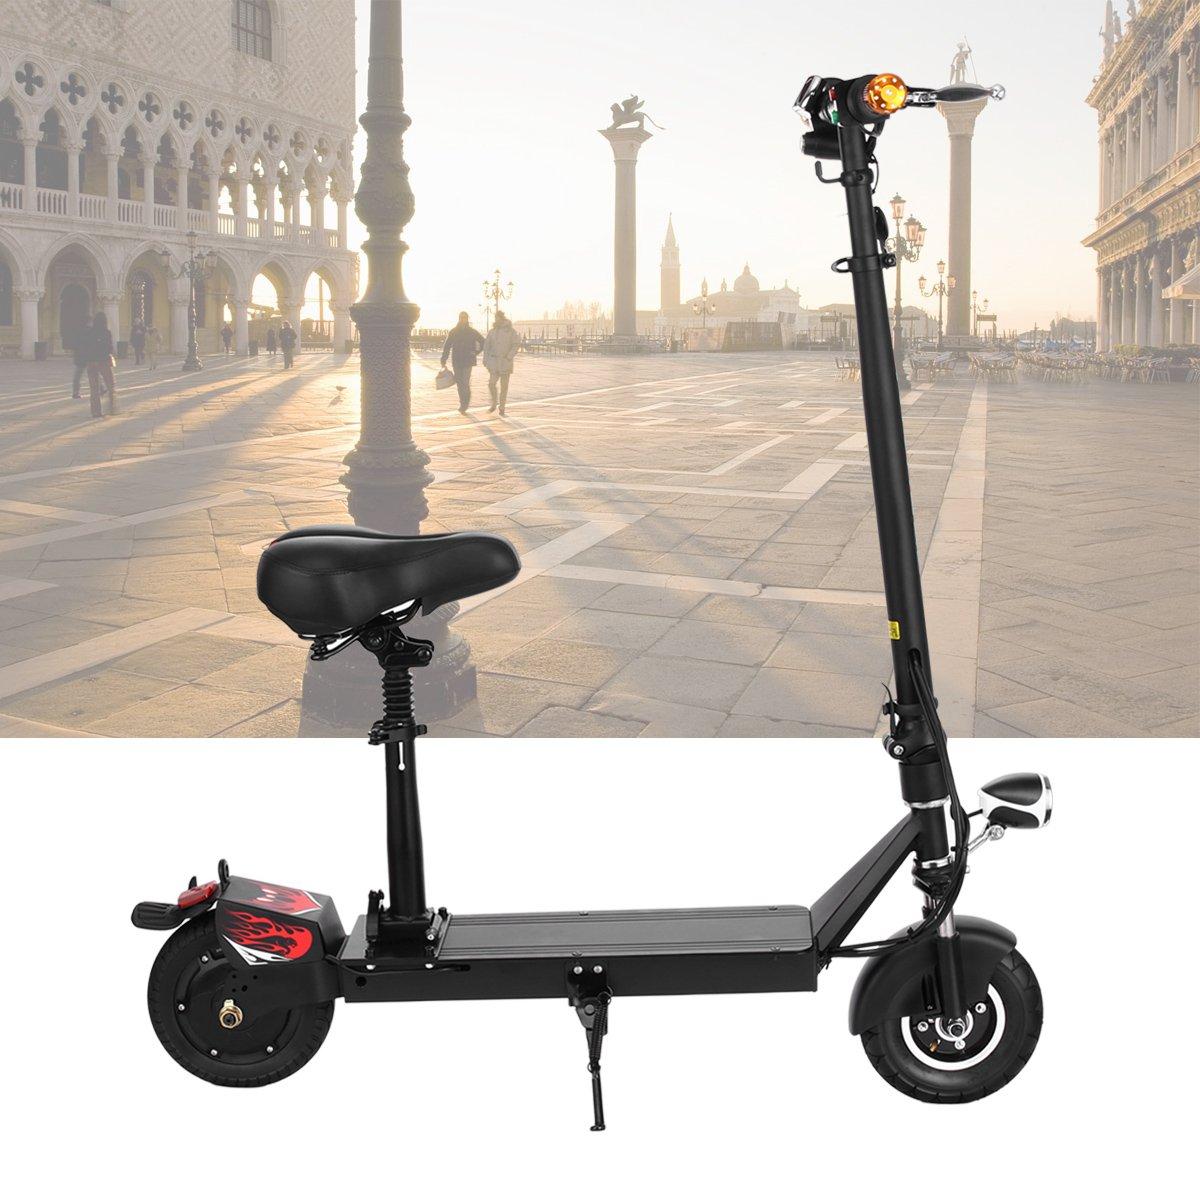 amdi rect eléctrico Scooter adultos S de scooter eléctrico ...